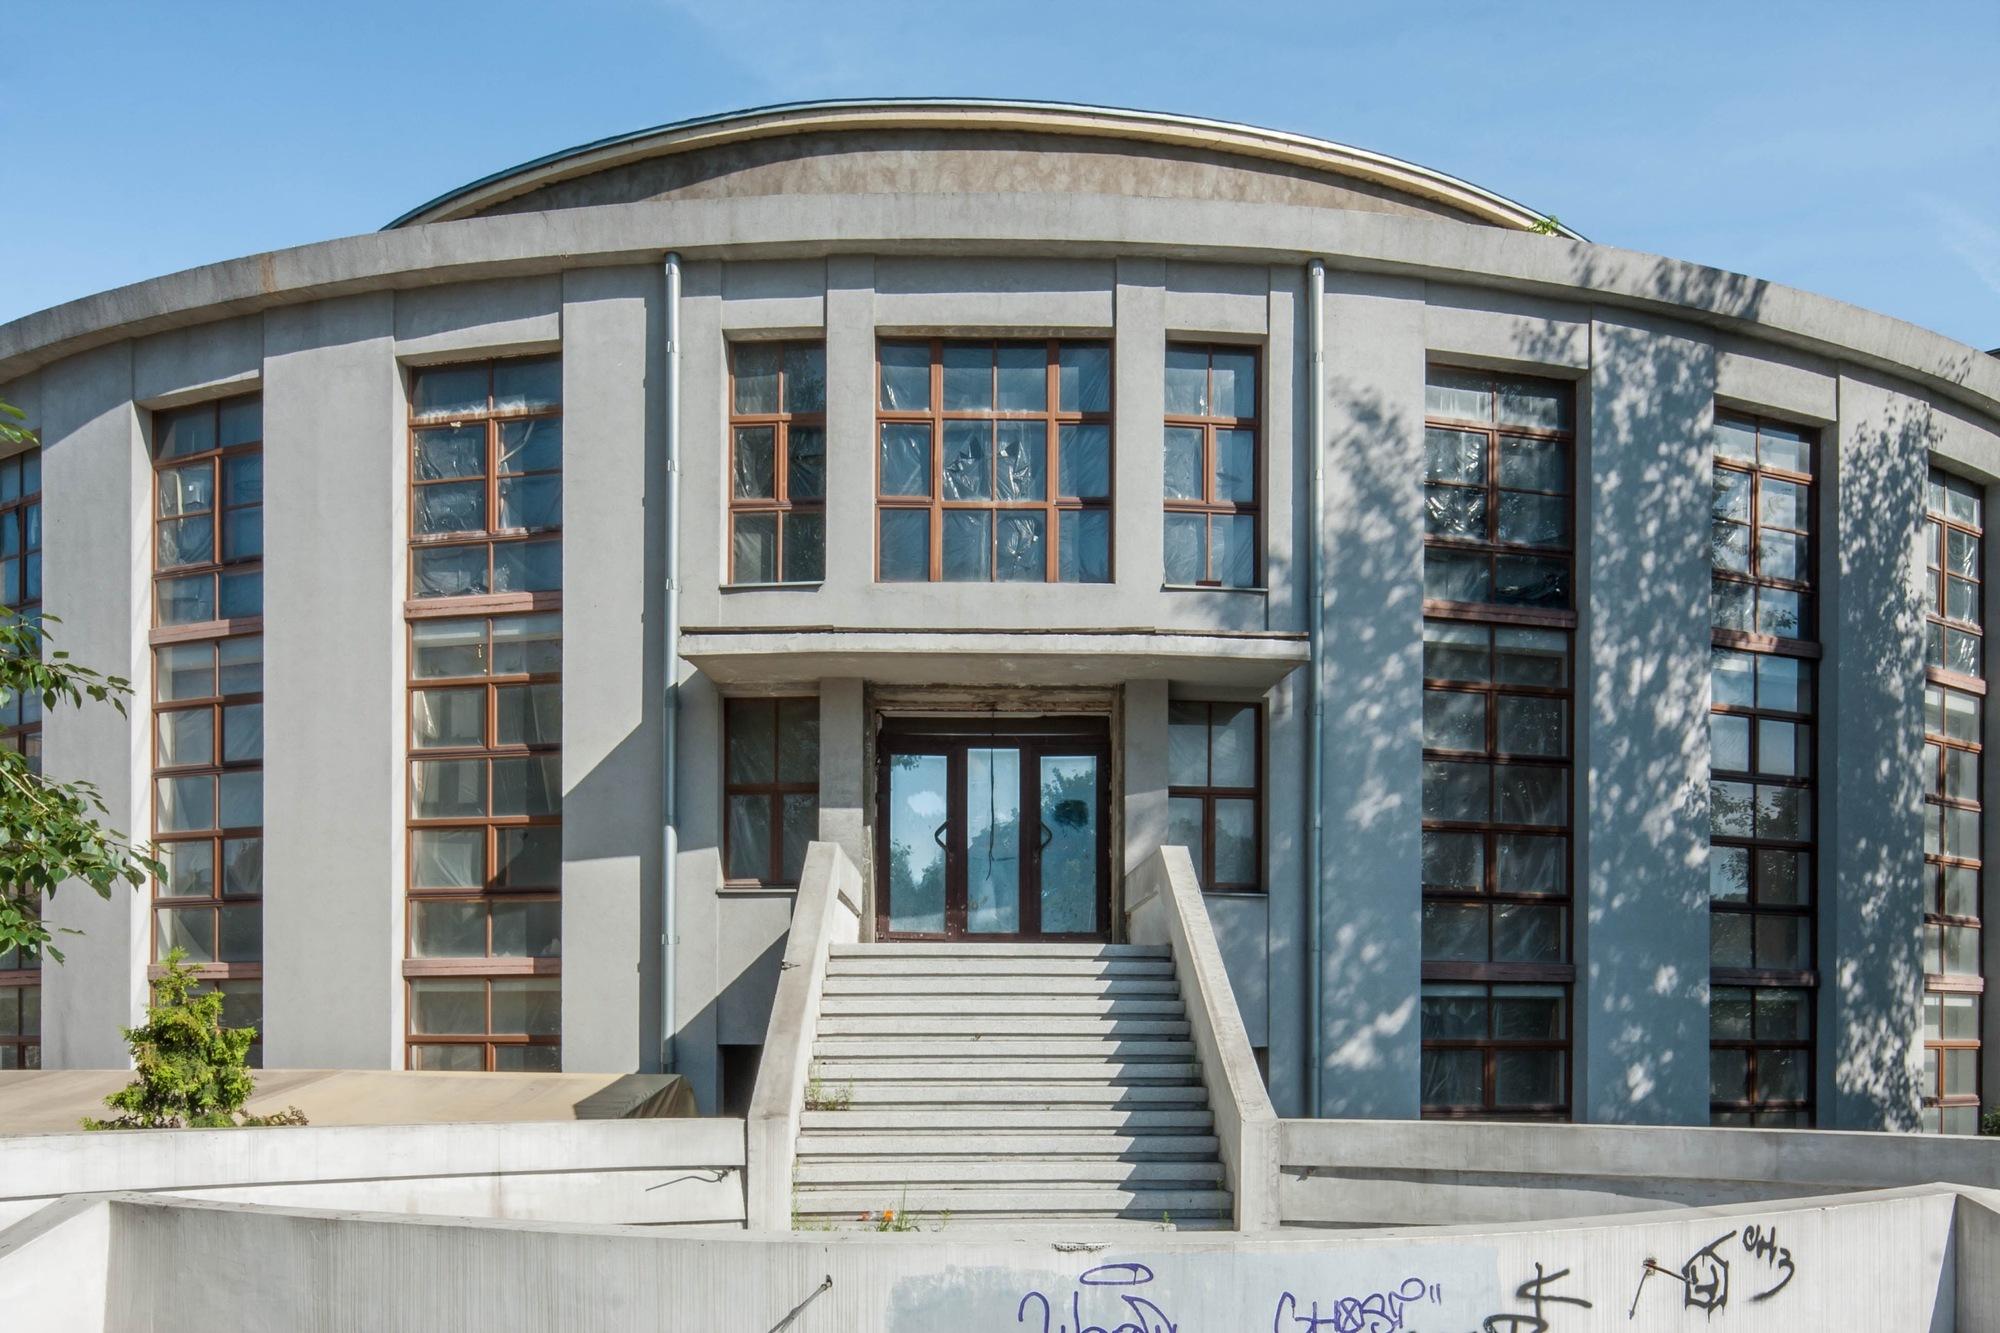 Gallery of the architecture of konstantin melnikov in for Architecture 54